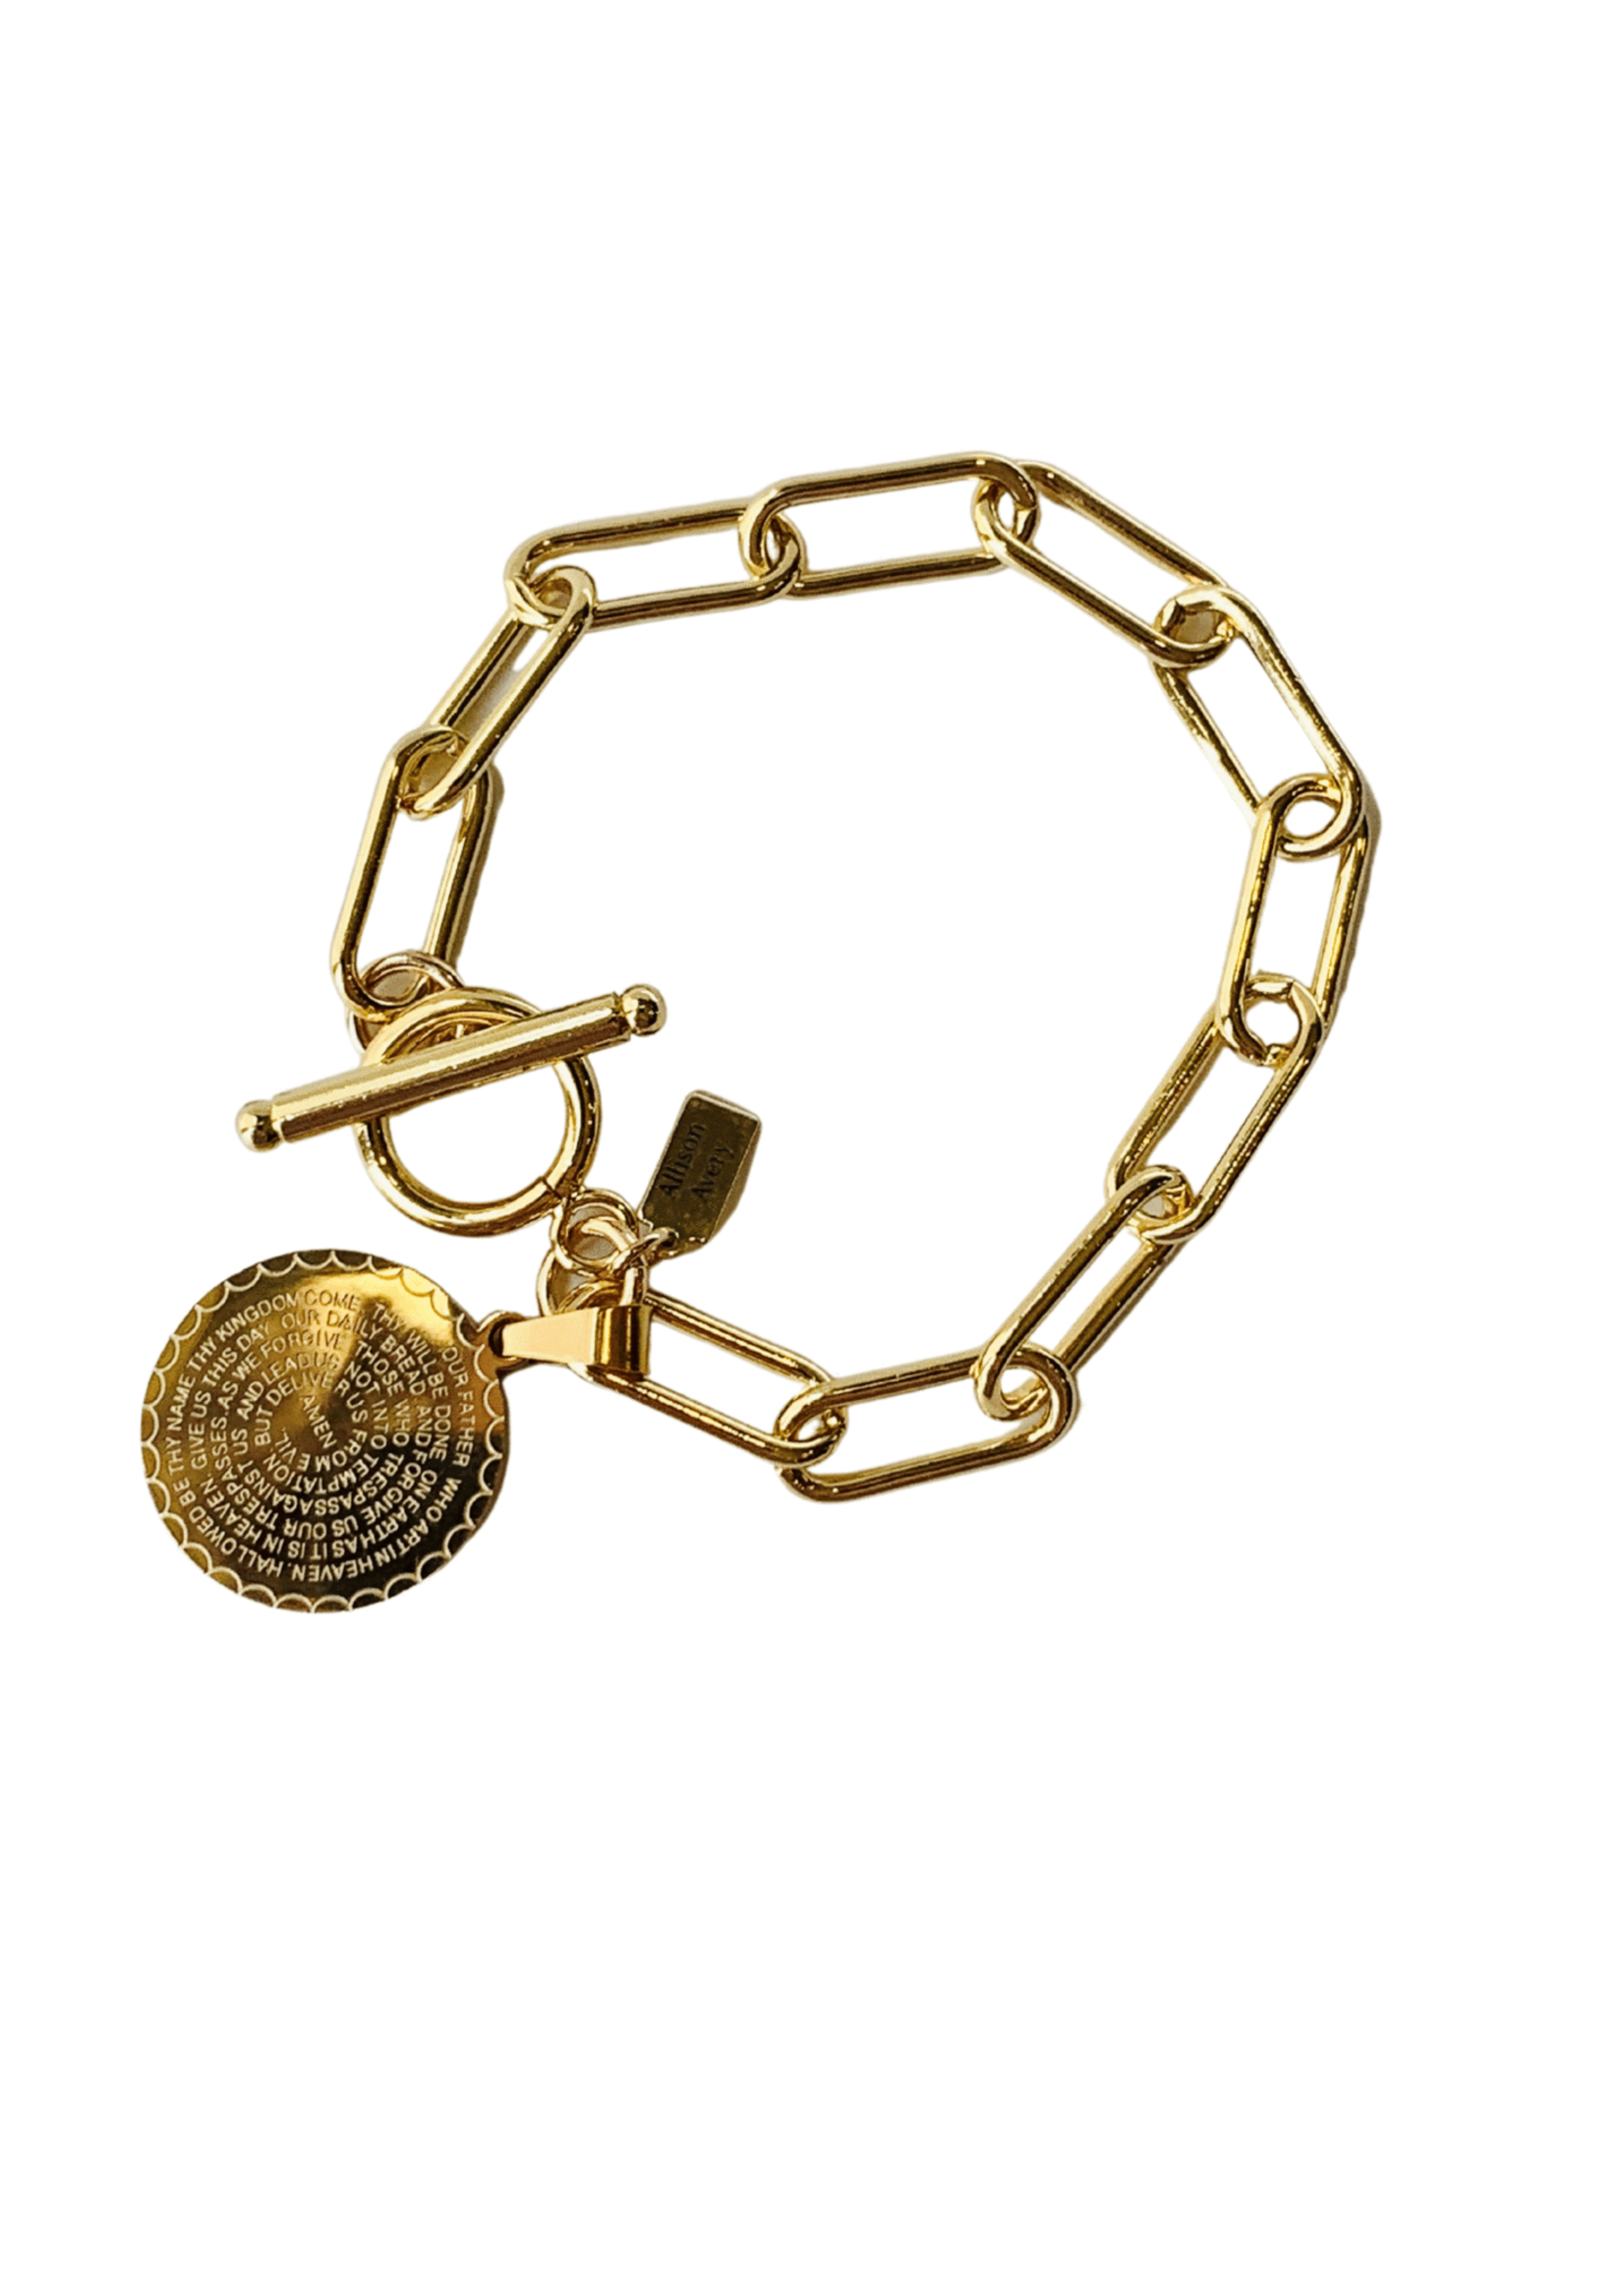 Allison Avery Lord's Prayer Bracelet